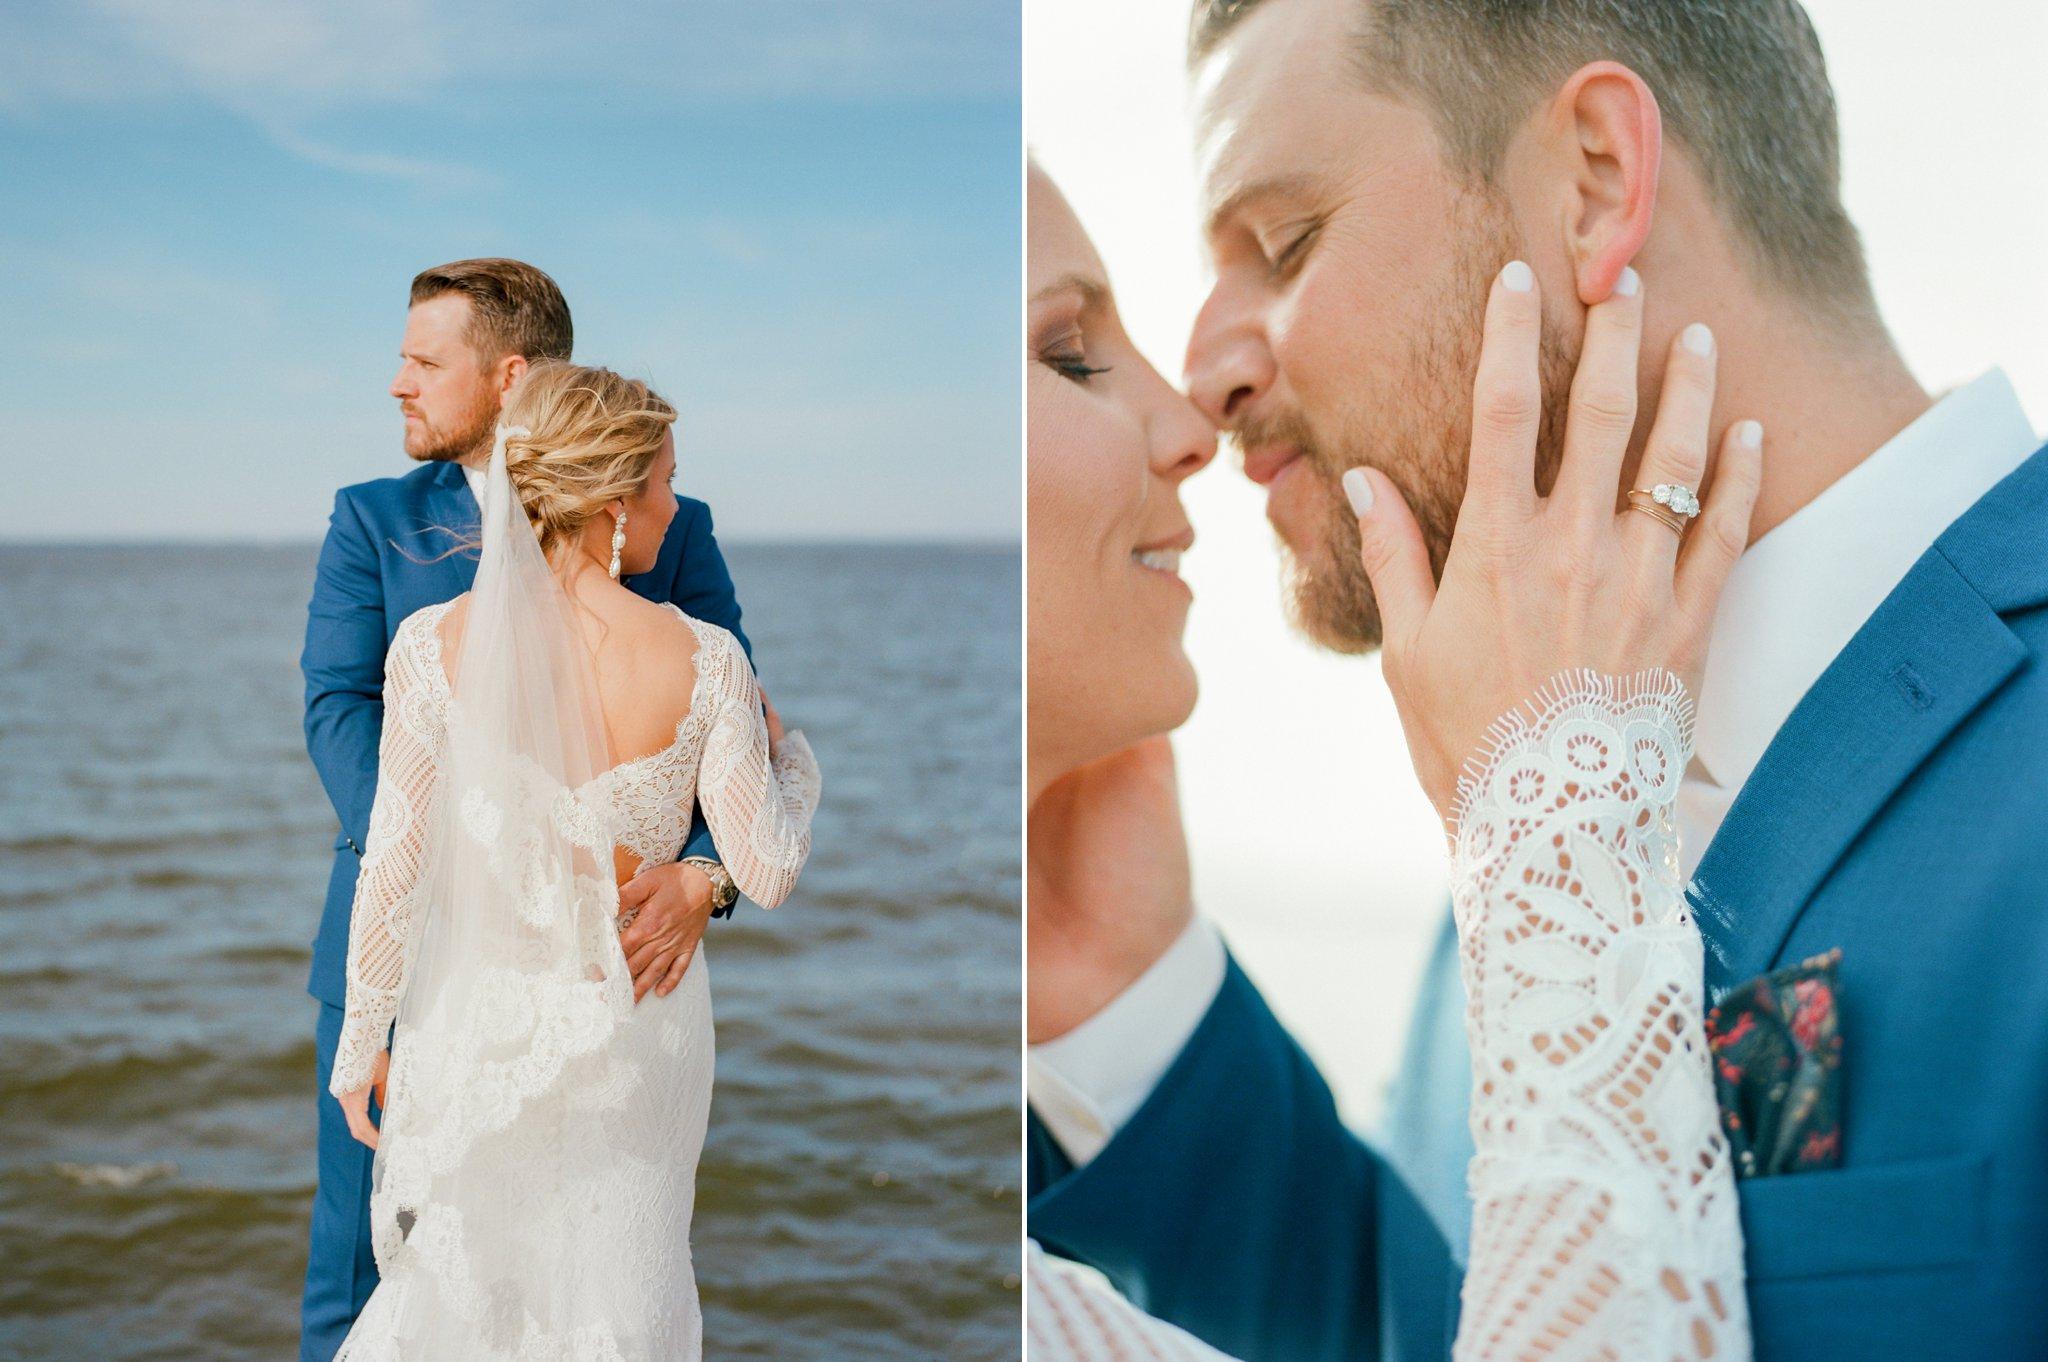 st+george+island+wedding+st+george+island+photographer+shannon+griffin+photography_0055.jpg